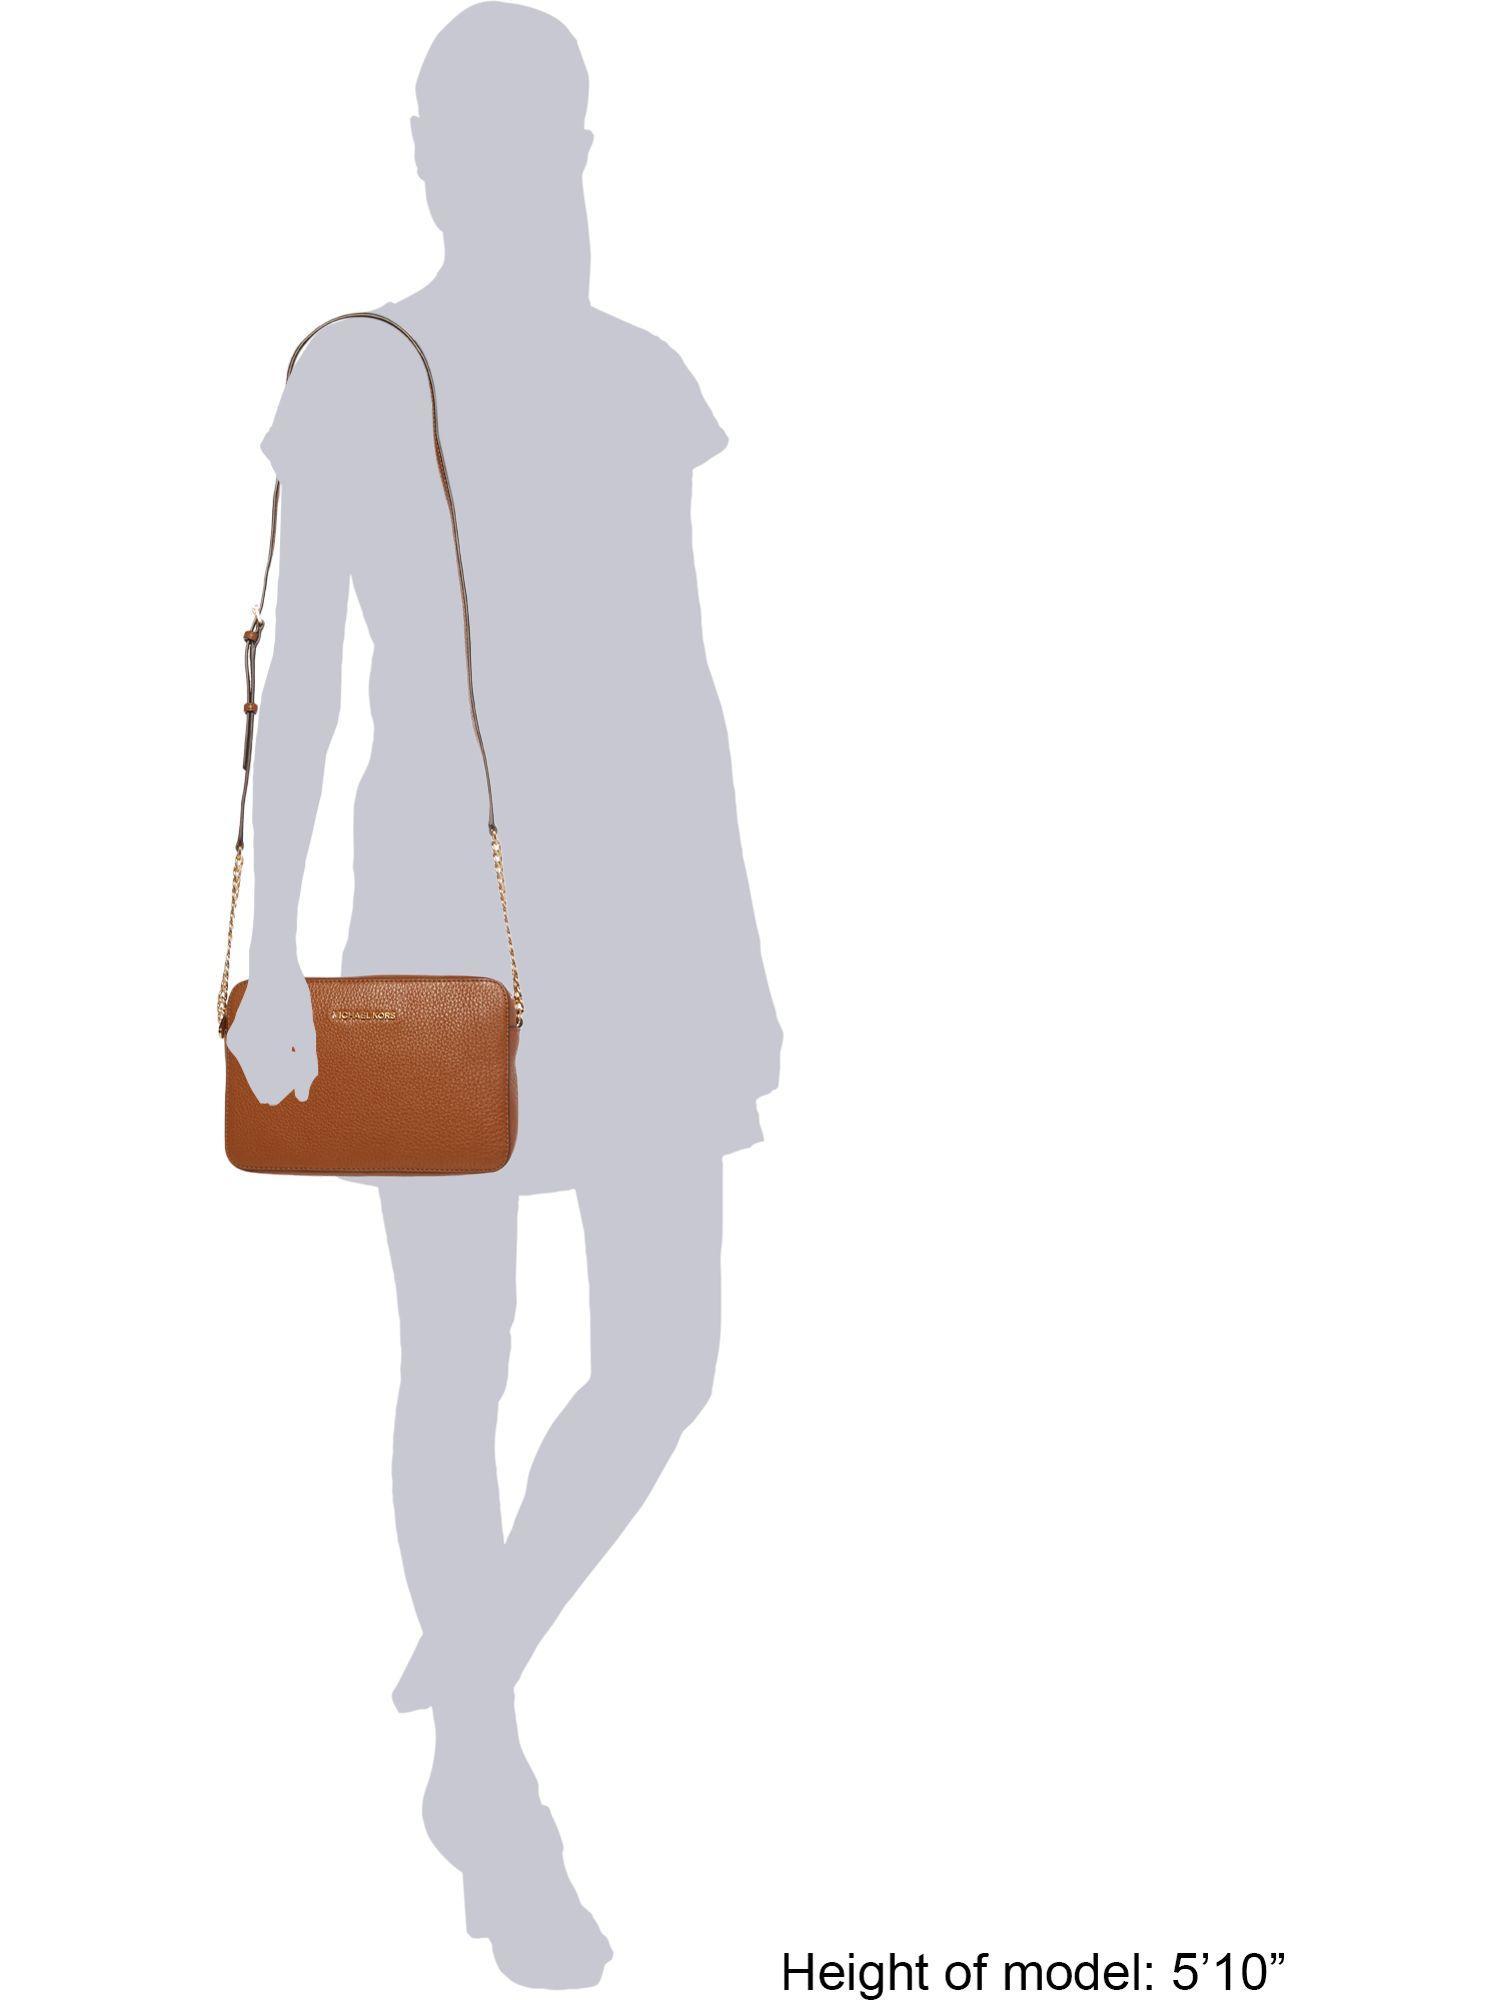 Michael Kors Leather Bedford Crossbody Bag in Tan (Brown)